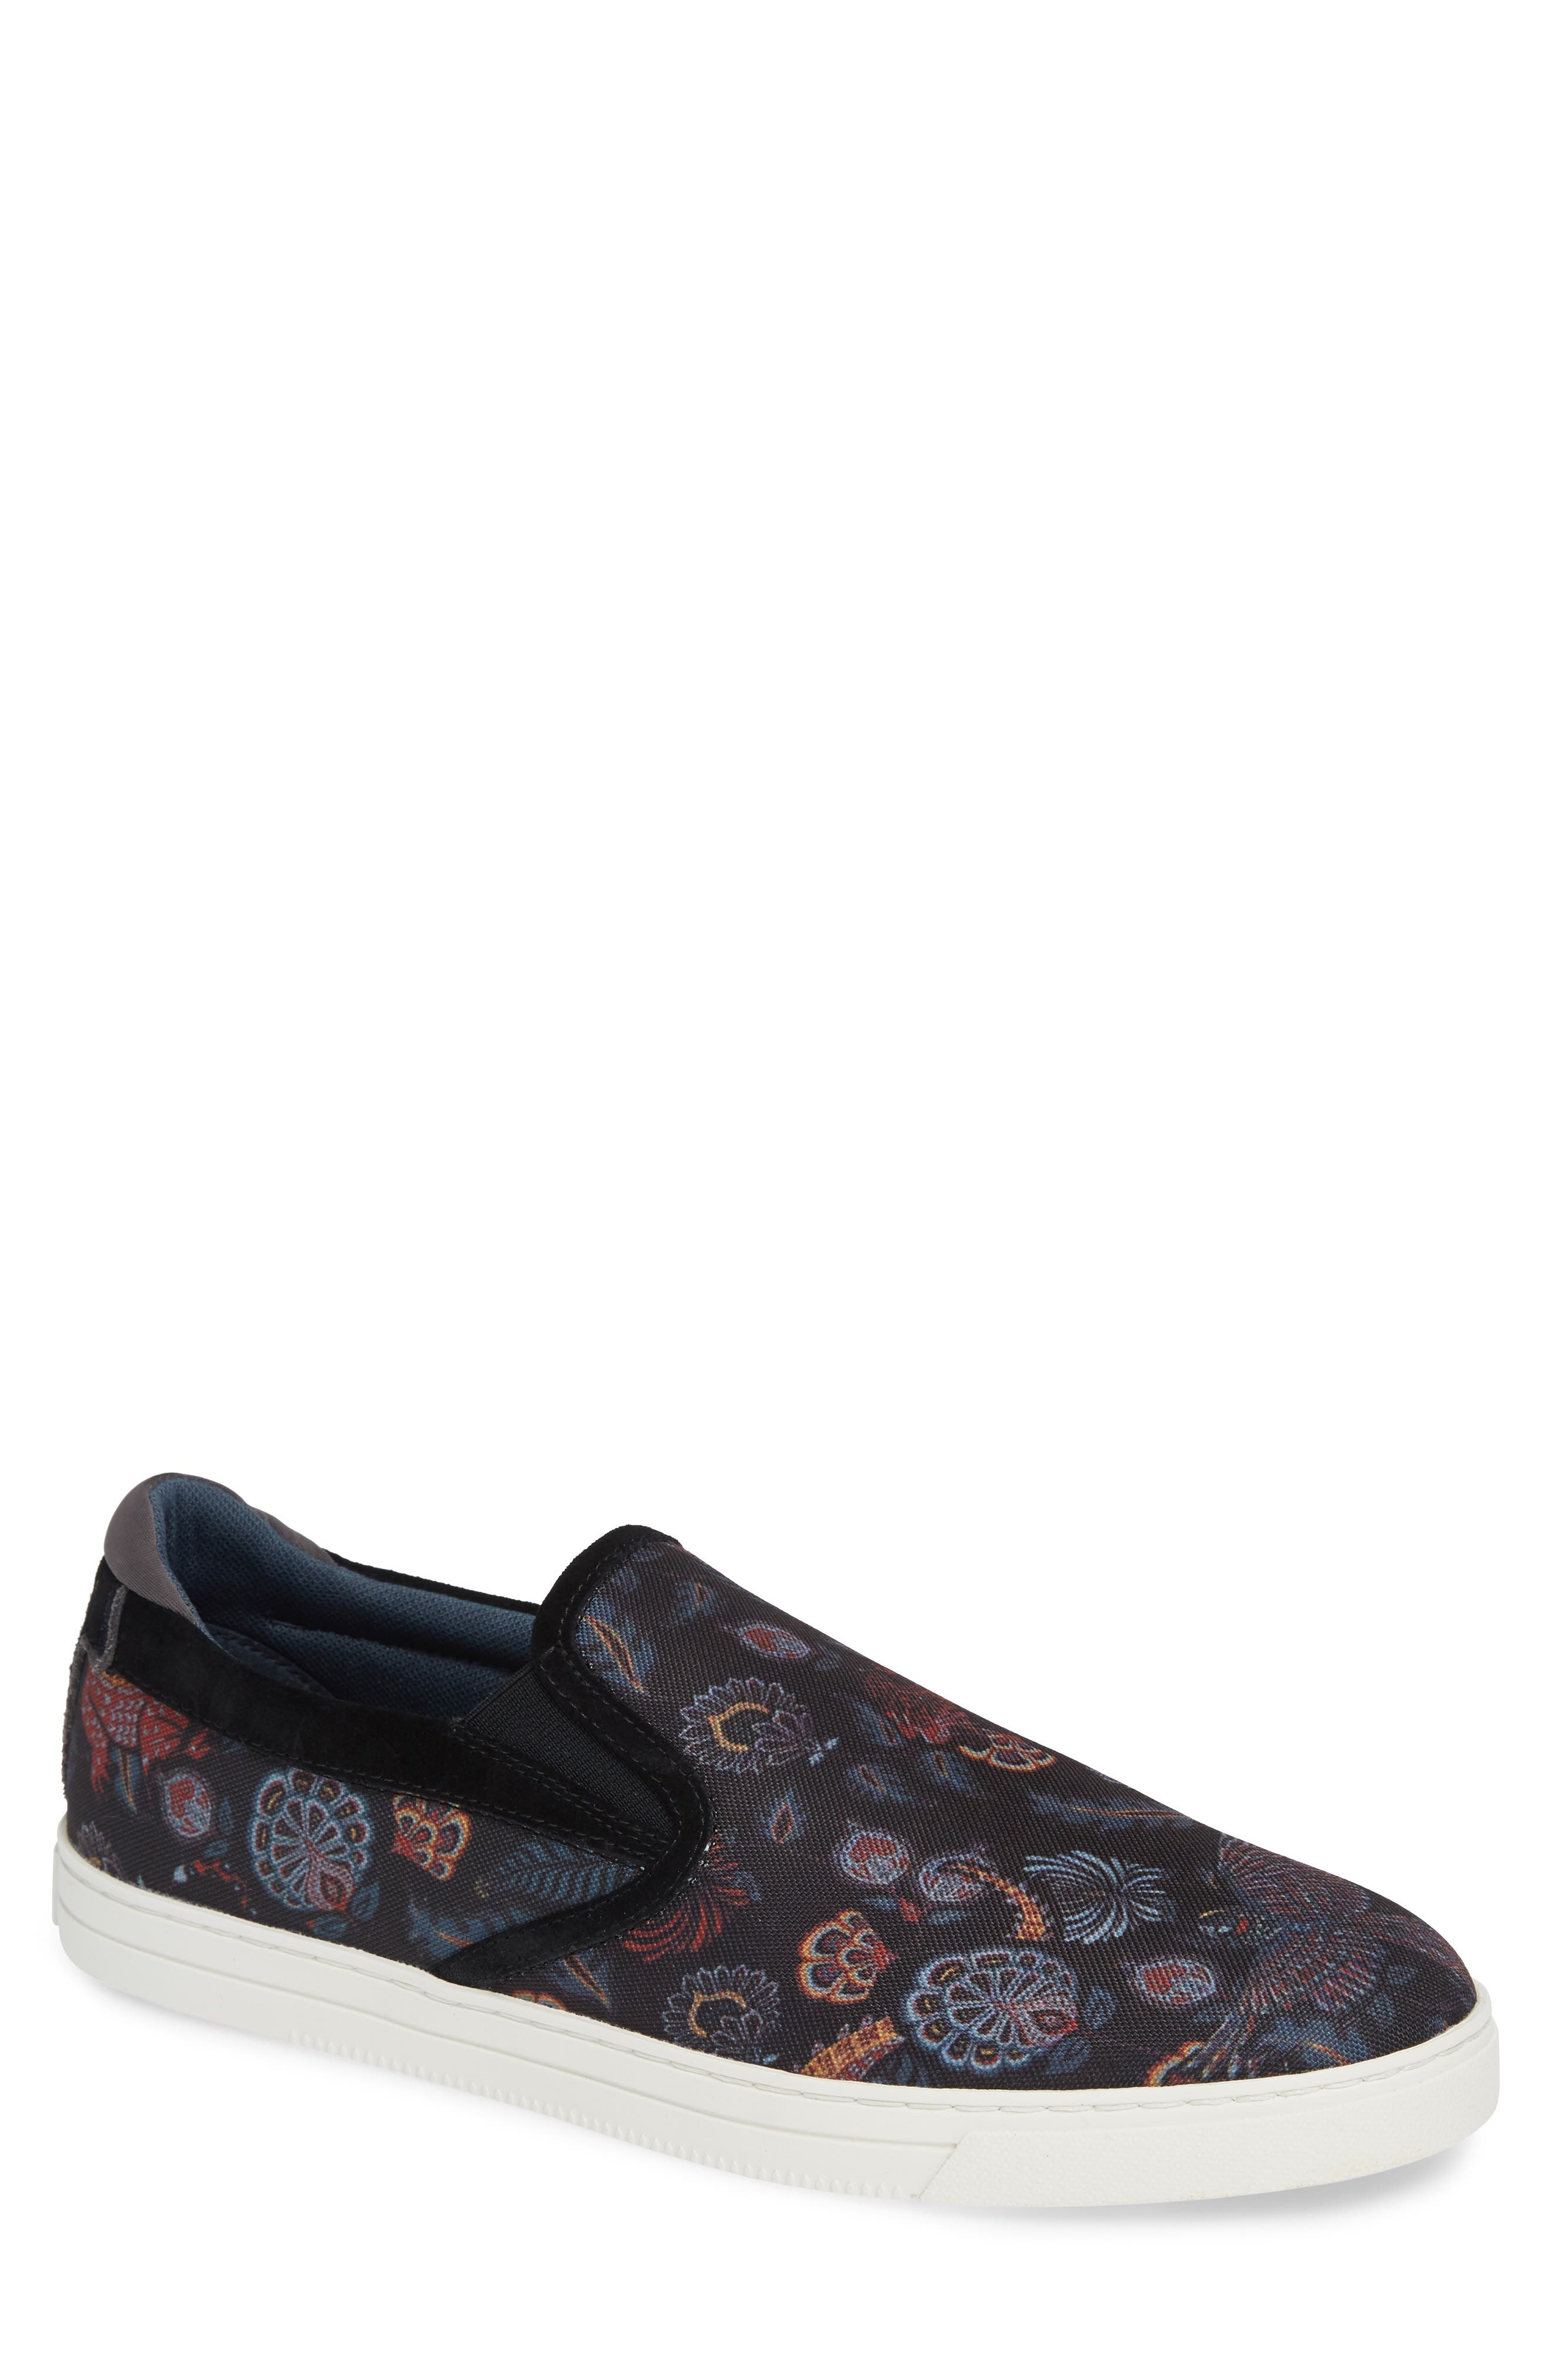 TED BAKER LONDON Mhako Slip-On Sneaker, Main, color, BLACK/ GREY